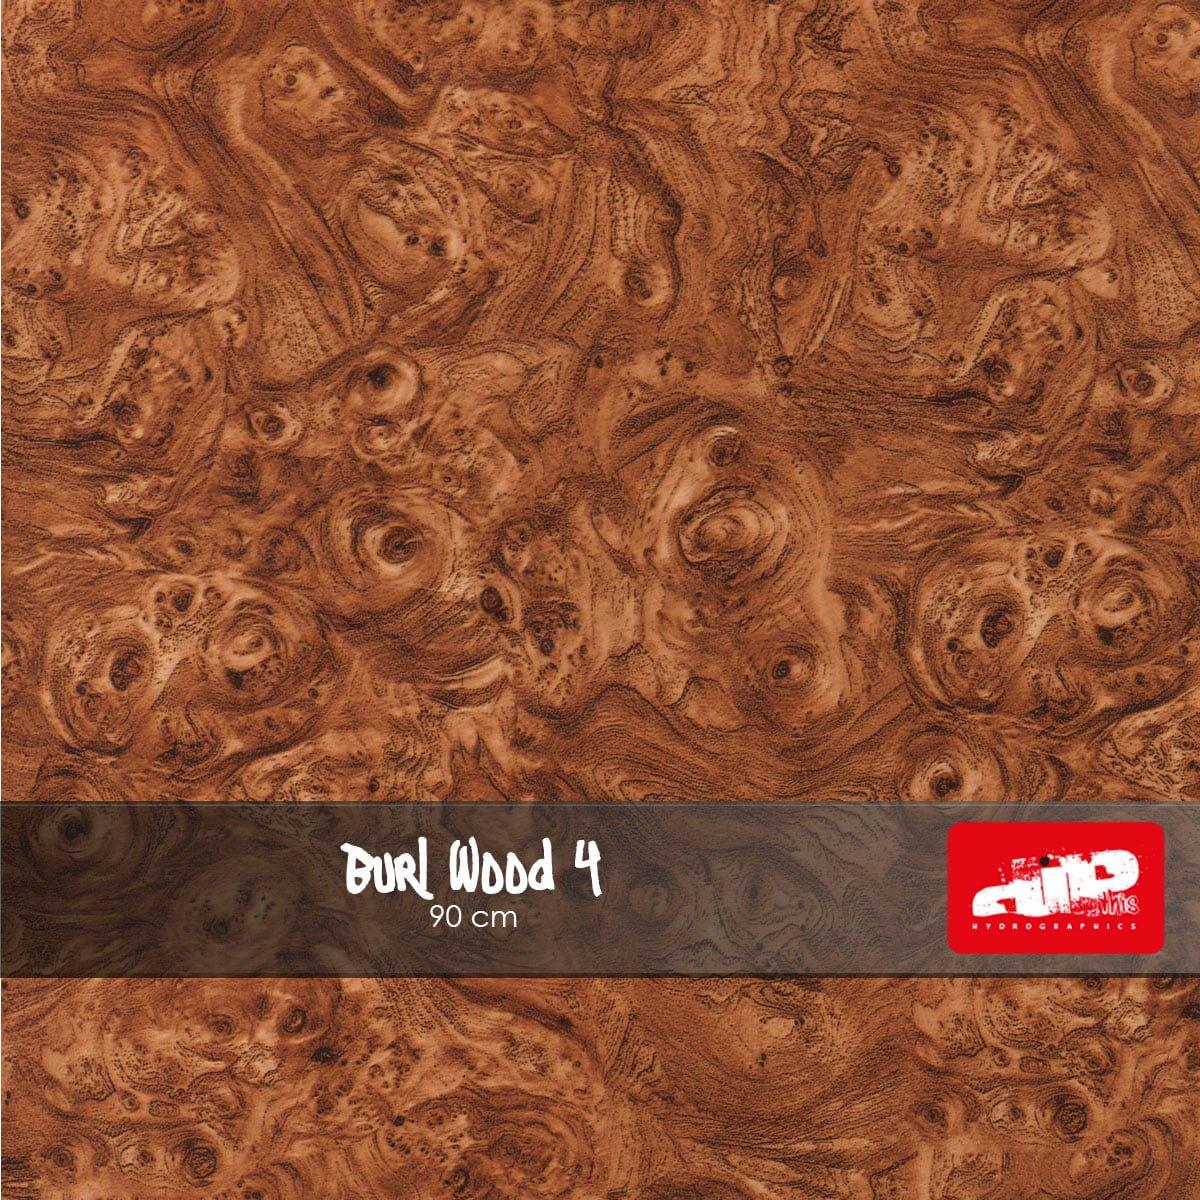 Burl Wood 4